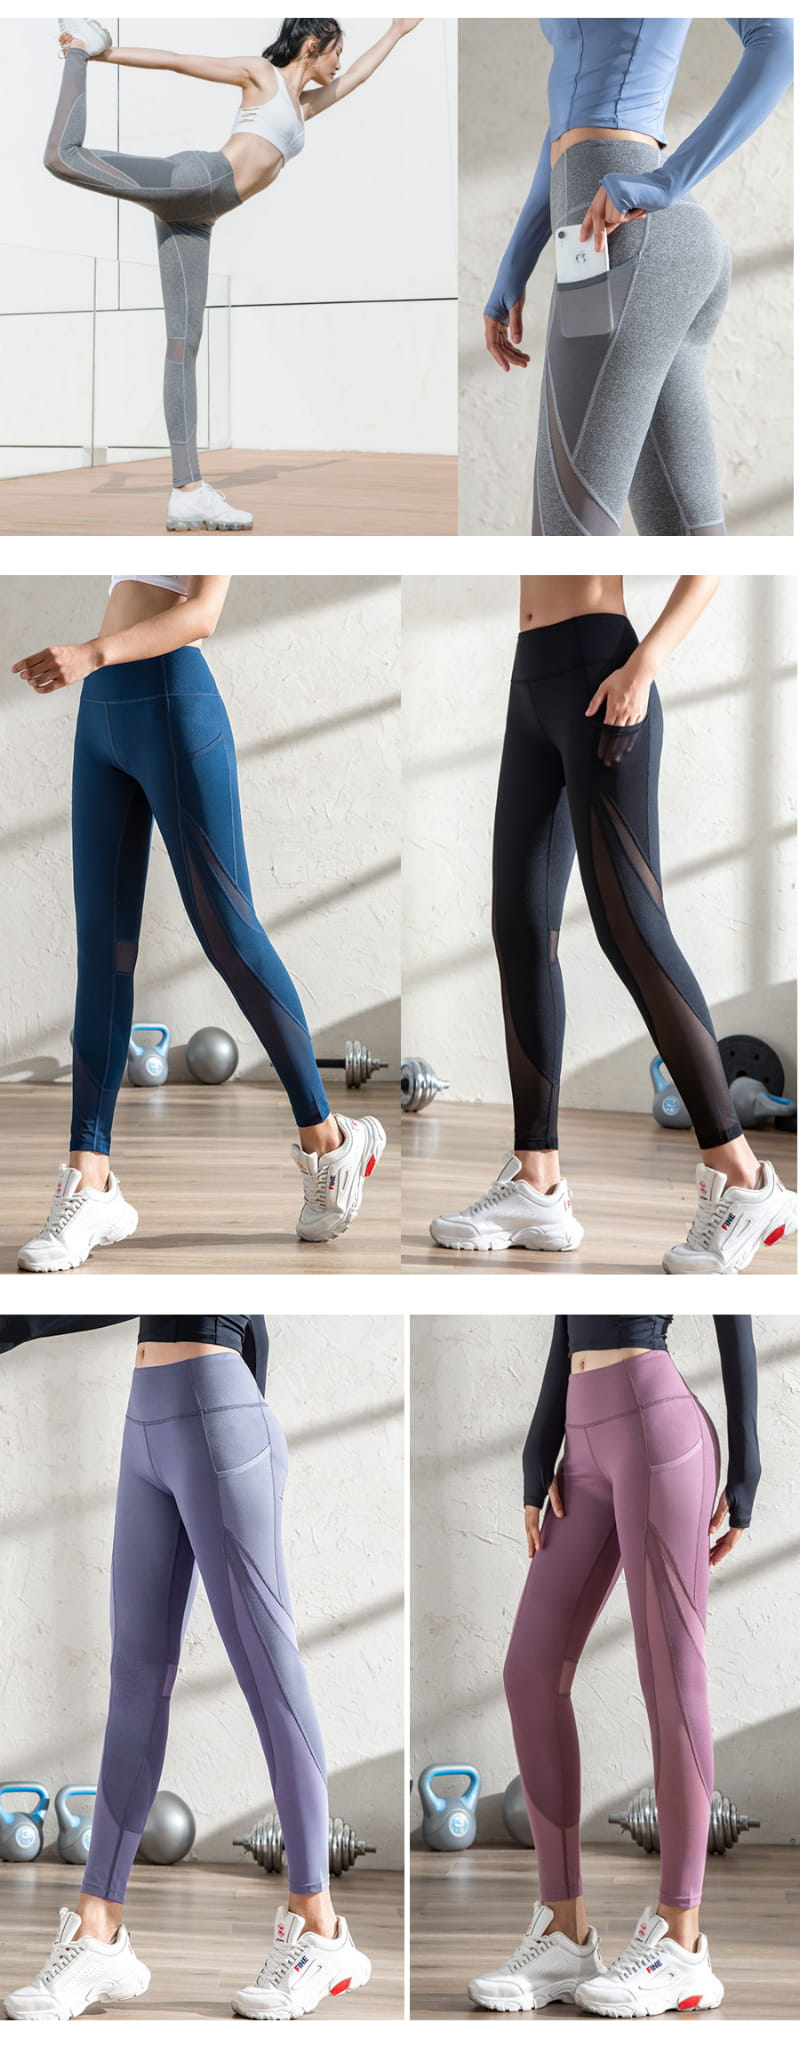 【Un-Sport高機能】網紗立裁-輕加壓顯瘦提臀吸濕排汗長褲(瑜伽/健身/路跑) 7